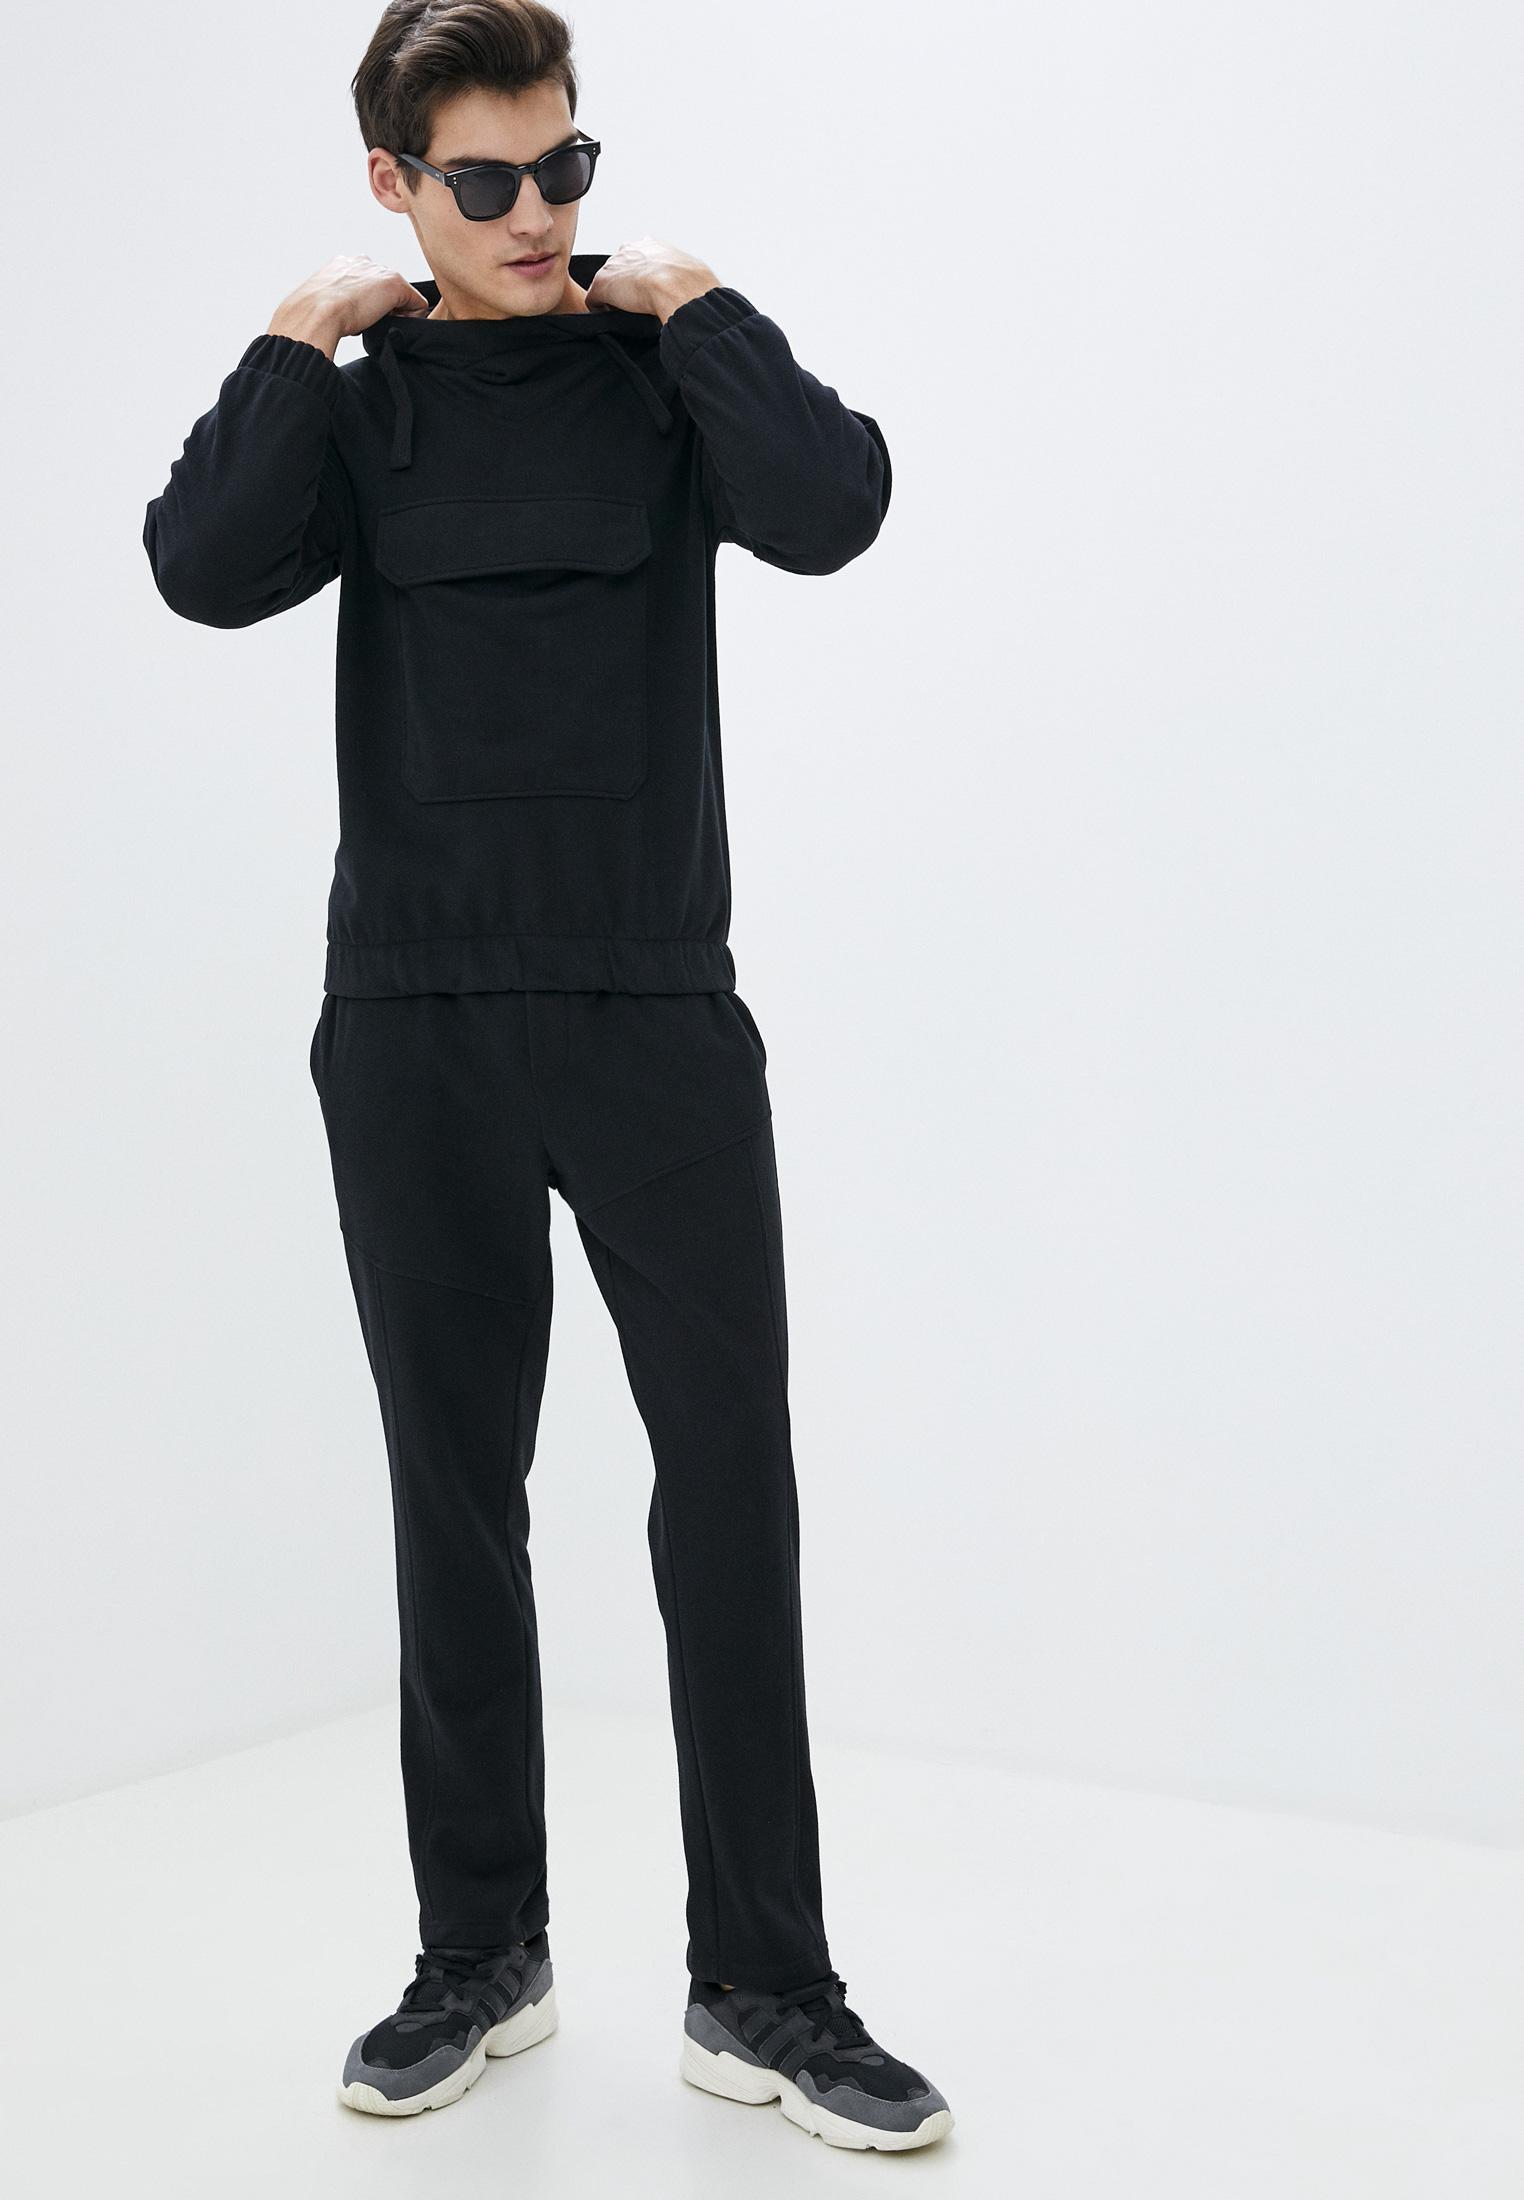 Спортивный костюм Sitlly 20801